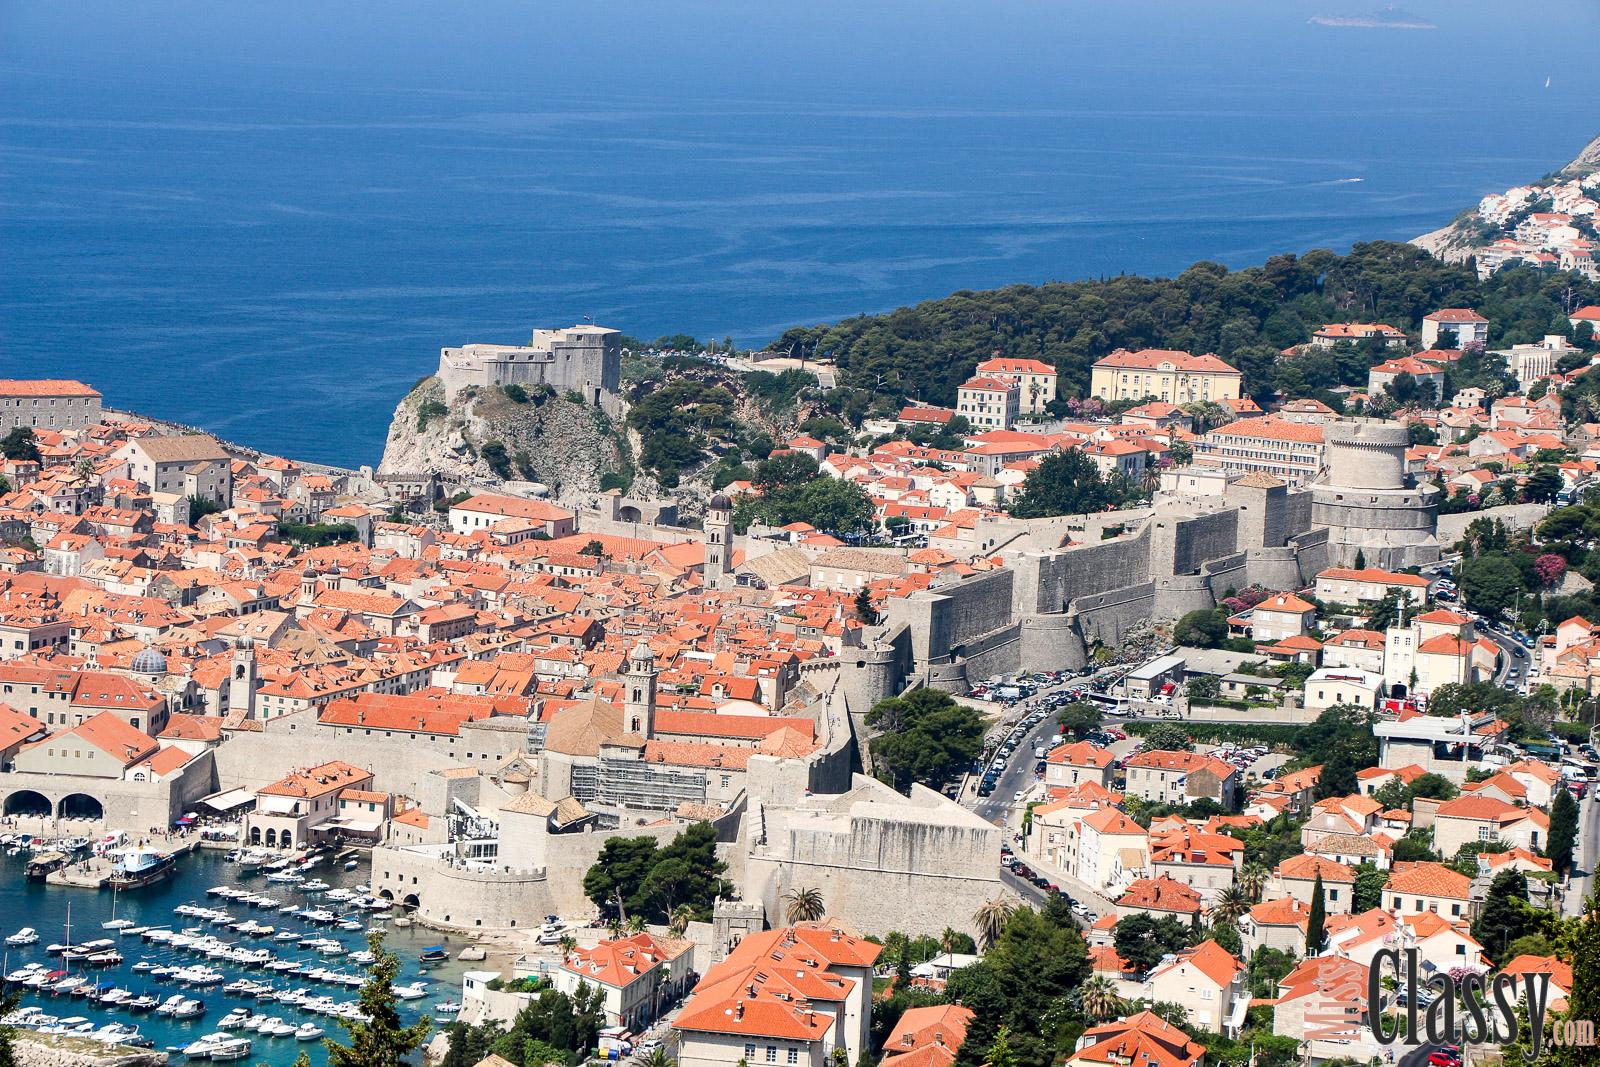 TRAVEL Dubrovnik, Miss Classy, miss-classy.com, Lifestyleblog, Lifestyleblogger, Lifestyleblog Graz, Travelblog, Travelblogger, Graz, Steiermark, Österreich, classy, beclassy, Reise, Travel, Wanderlust, Wayfarer, Kroatien, Dubrovnik, Stadtmauer, Game of Thrones, Mlini, Altstadt Dubrovnik, Hafen Dubrovnik